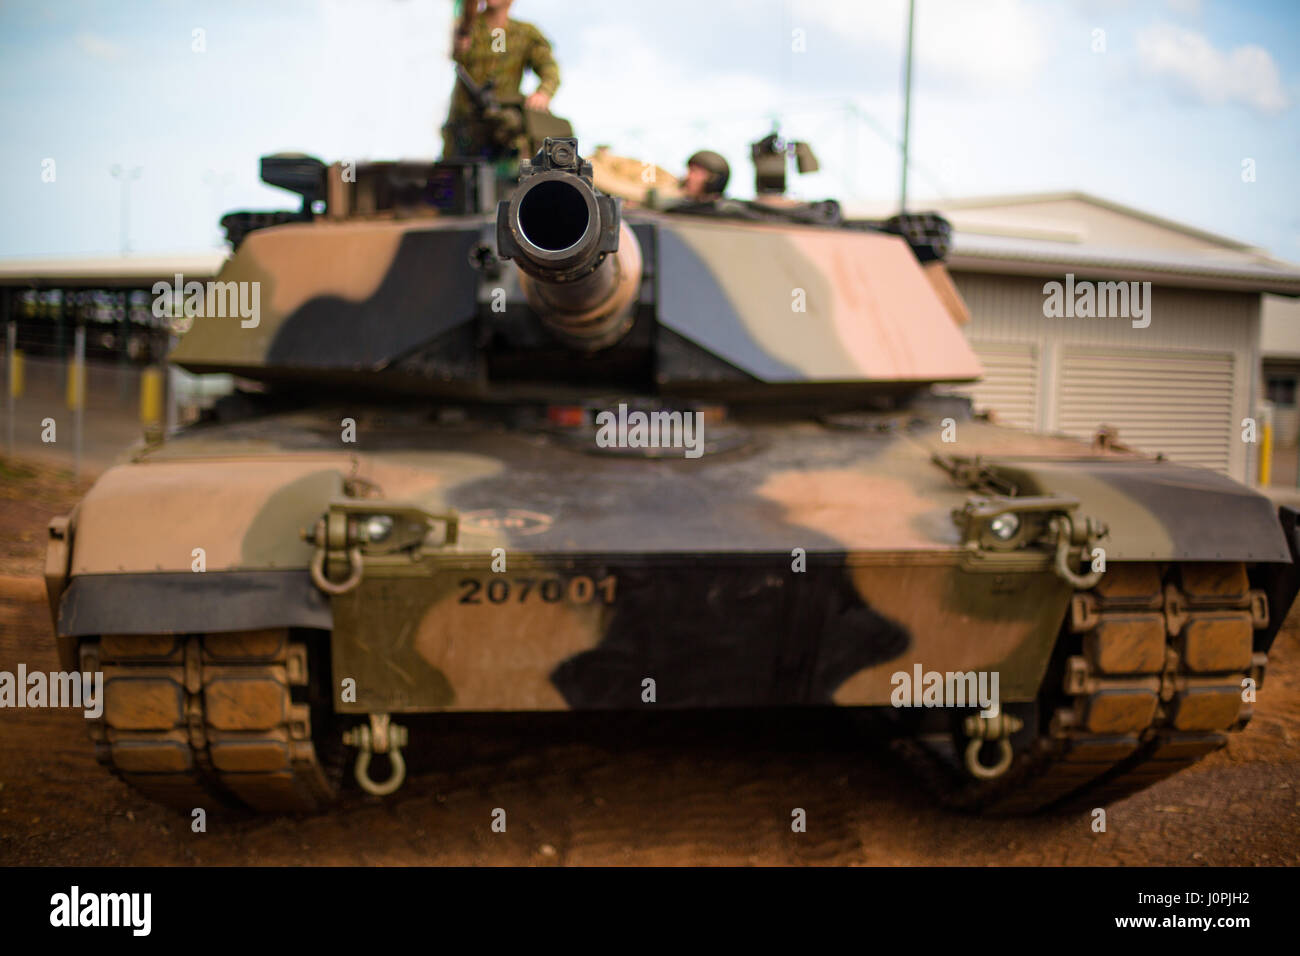 An Australian Abrams main battle tank of 1st Armoured Divison, Australia - Stock Image